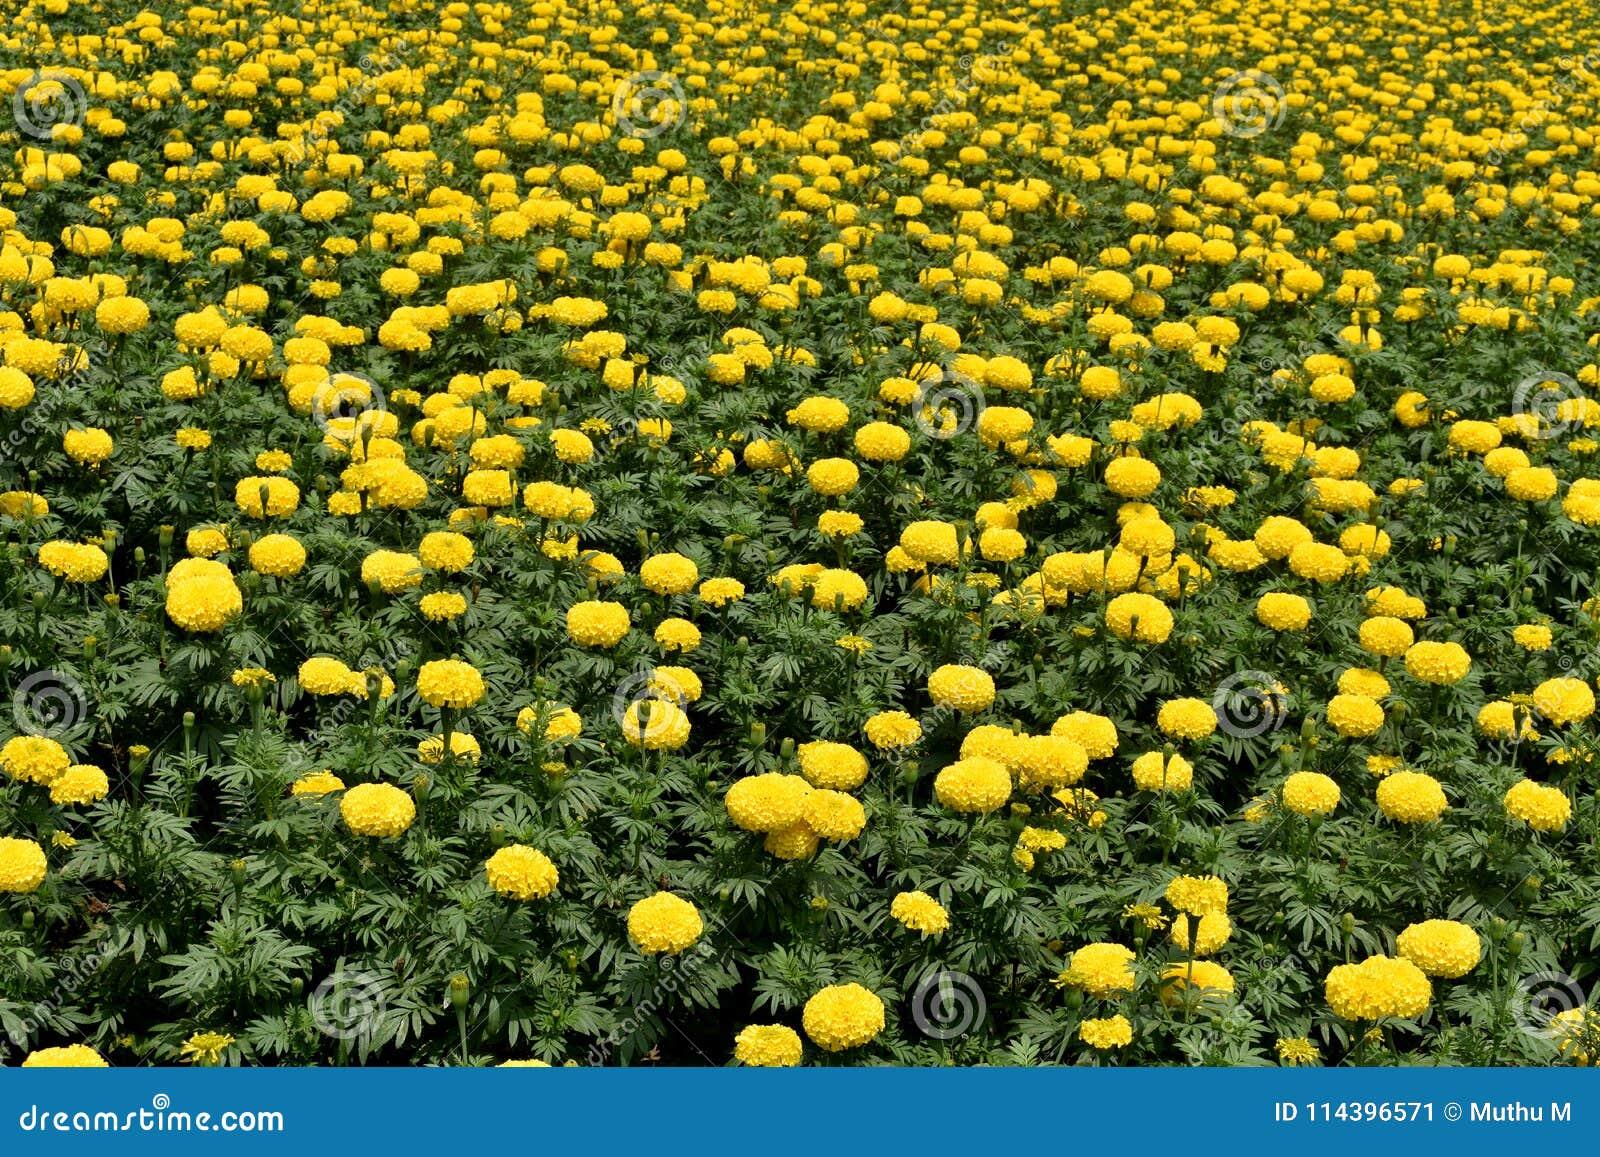 黄色菊花, Samanthi poo,菊花indicum